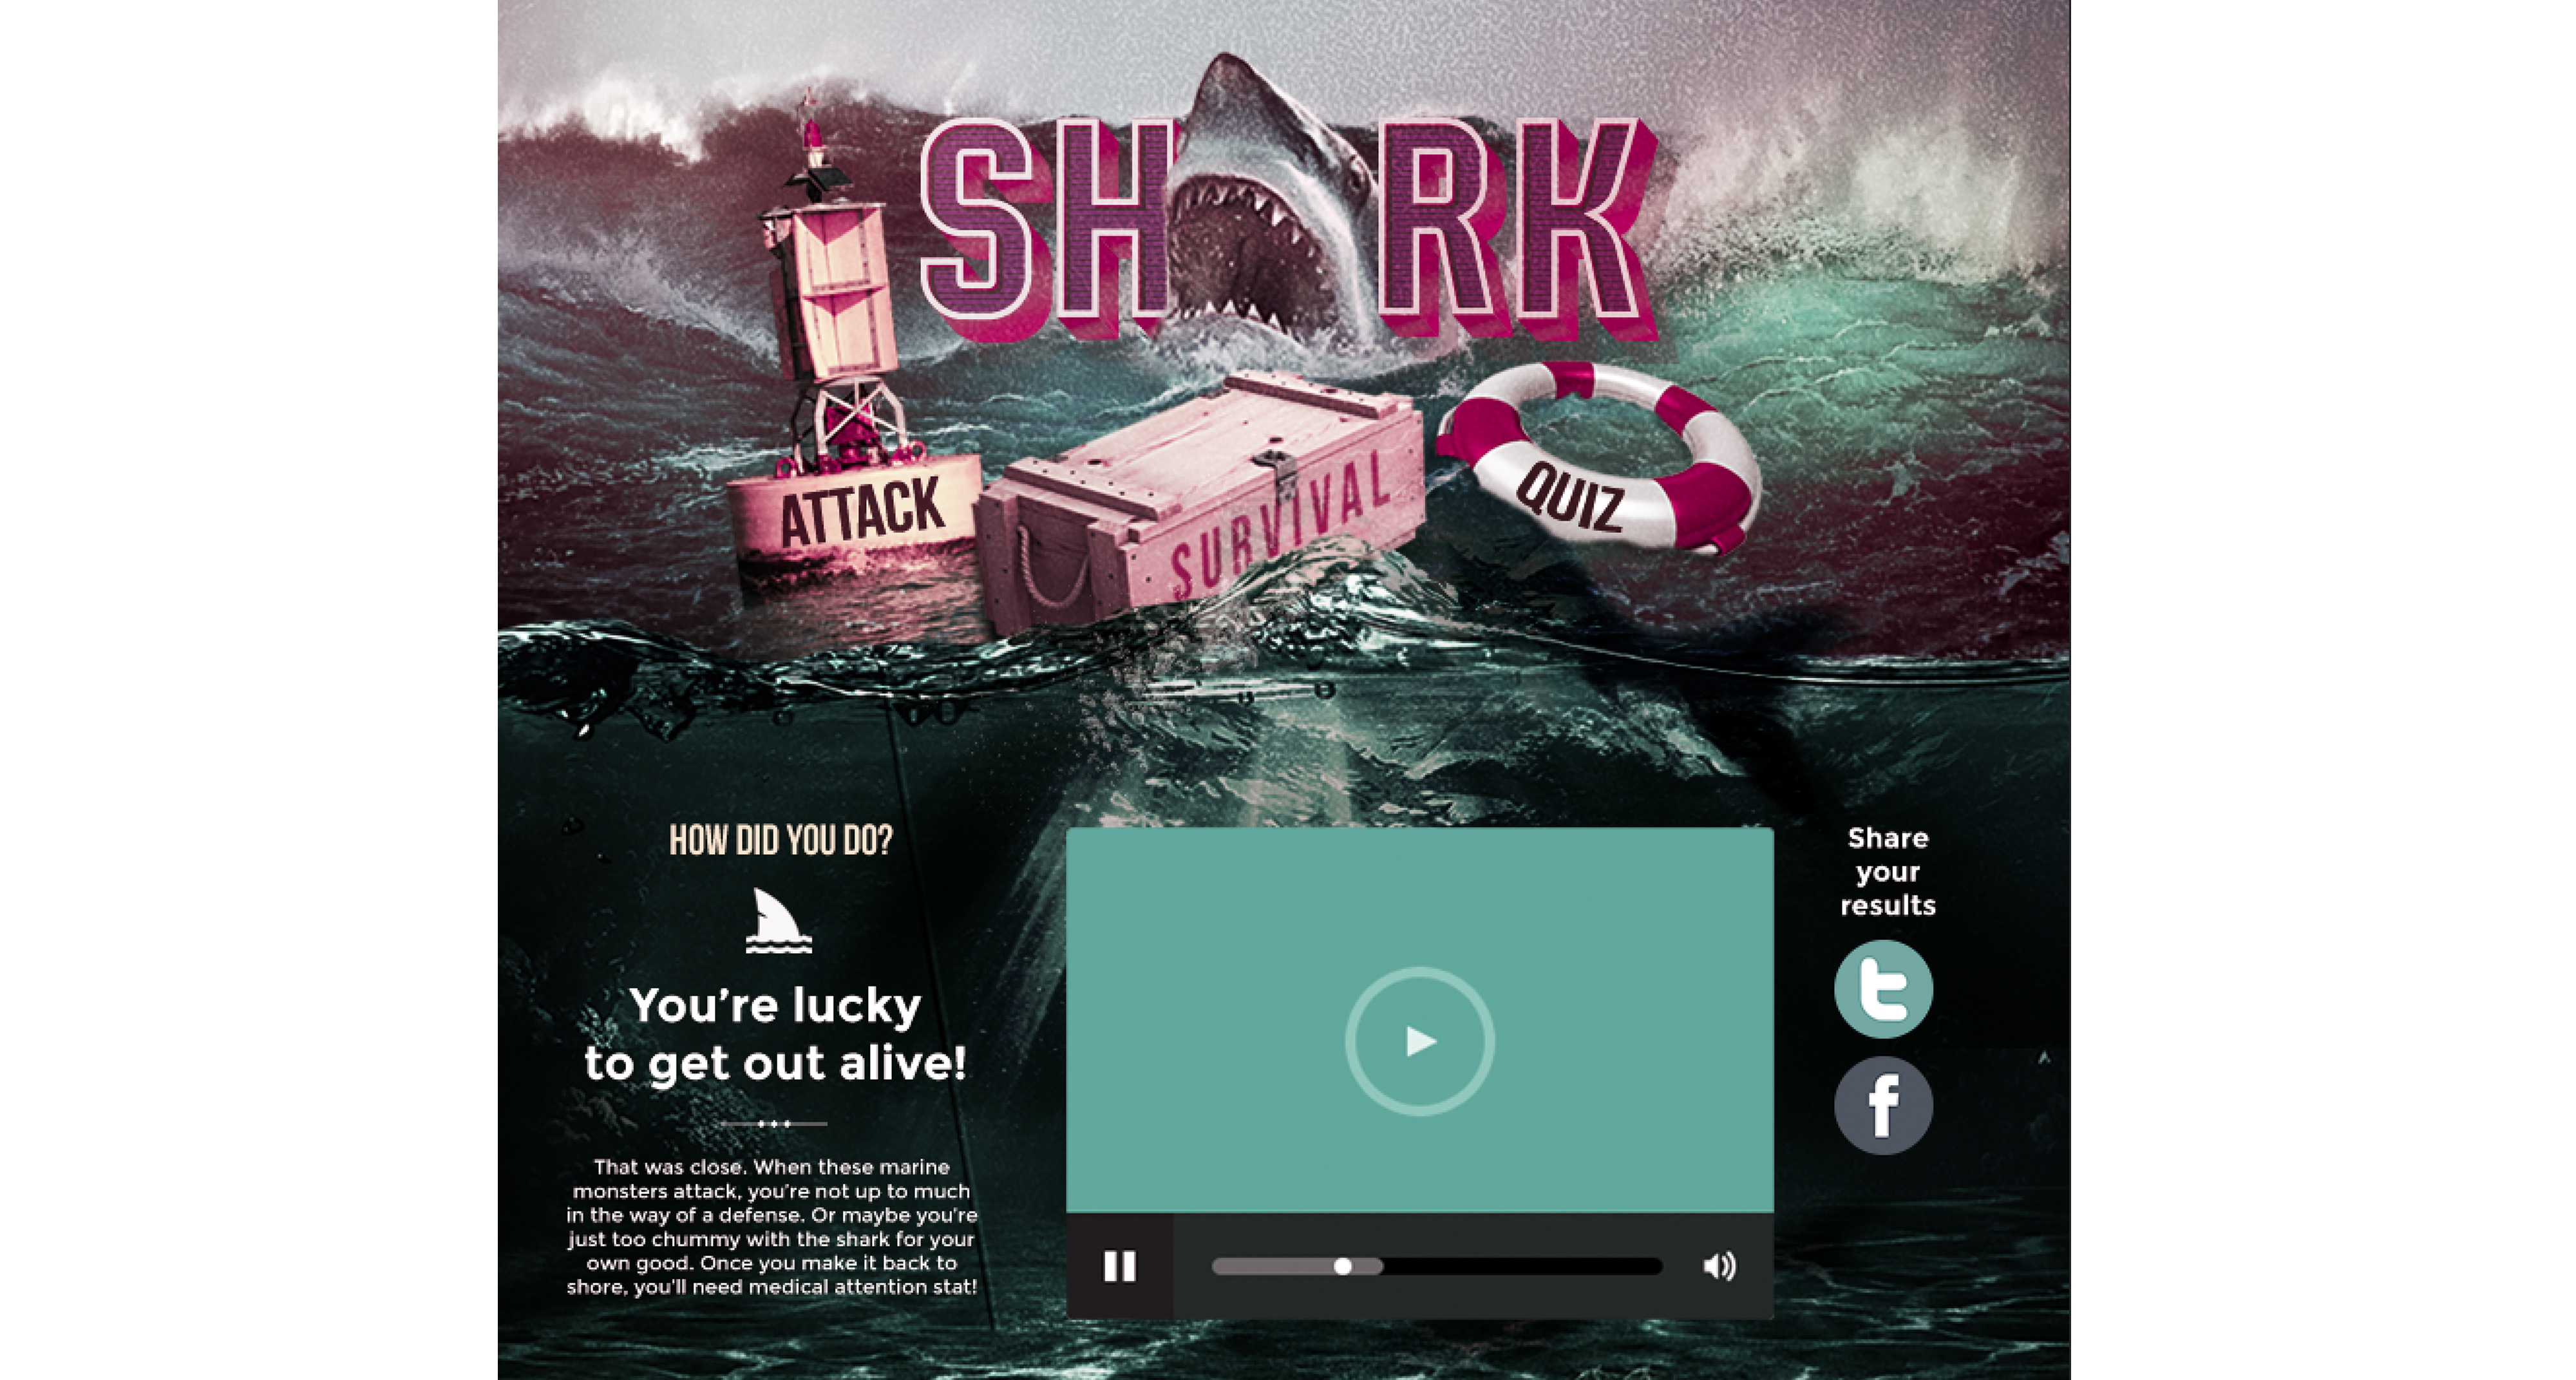 shark_r3